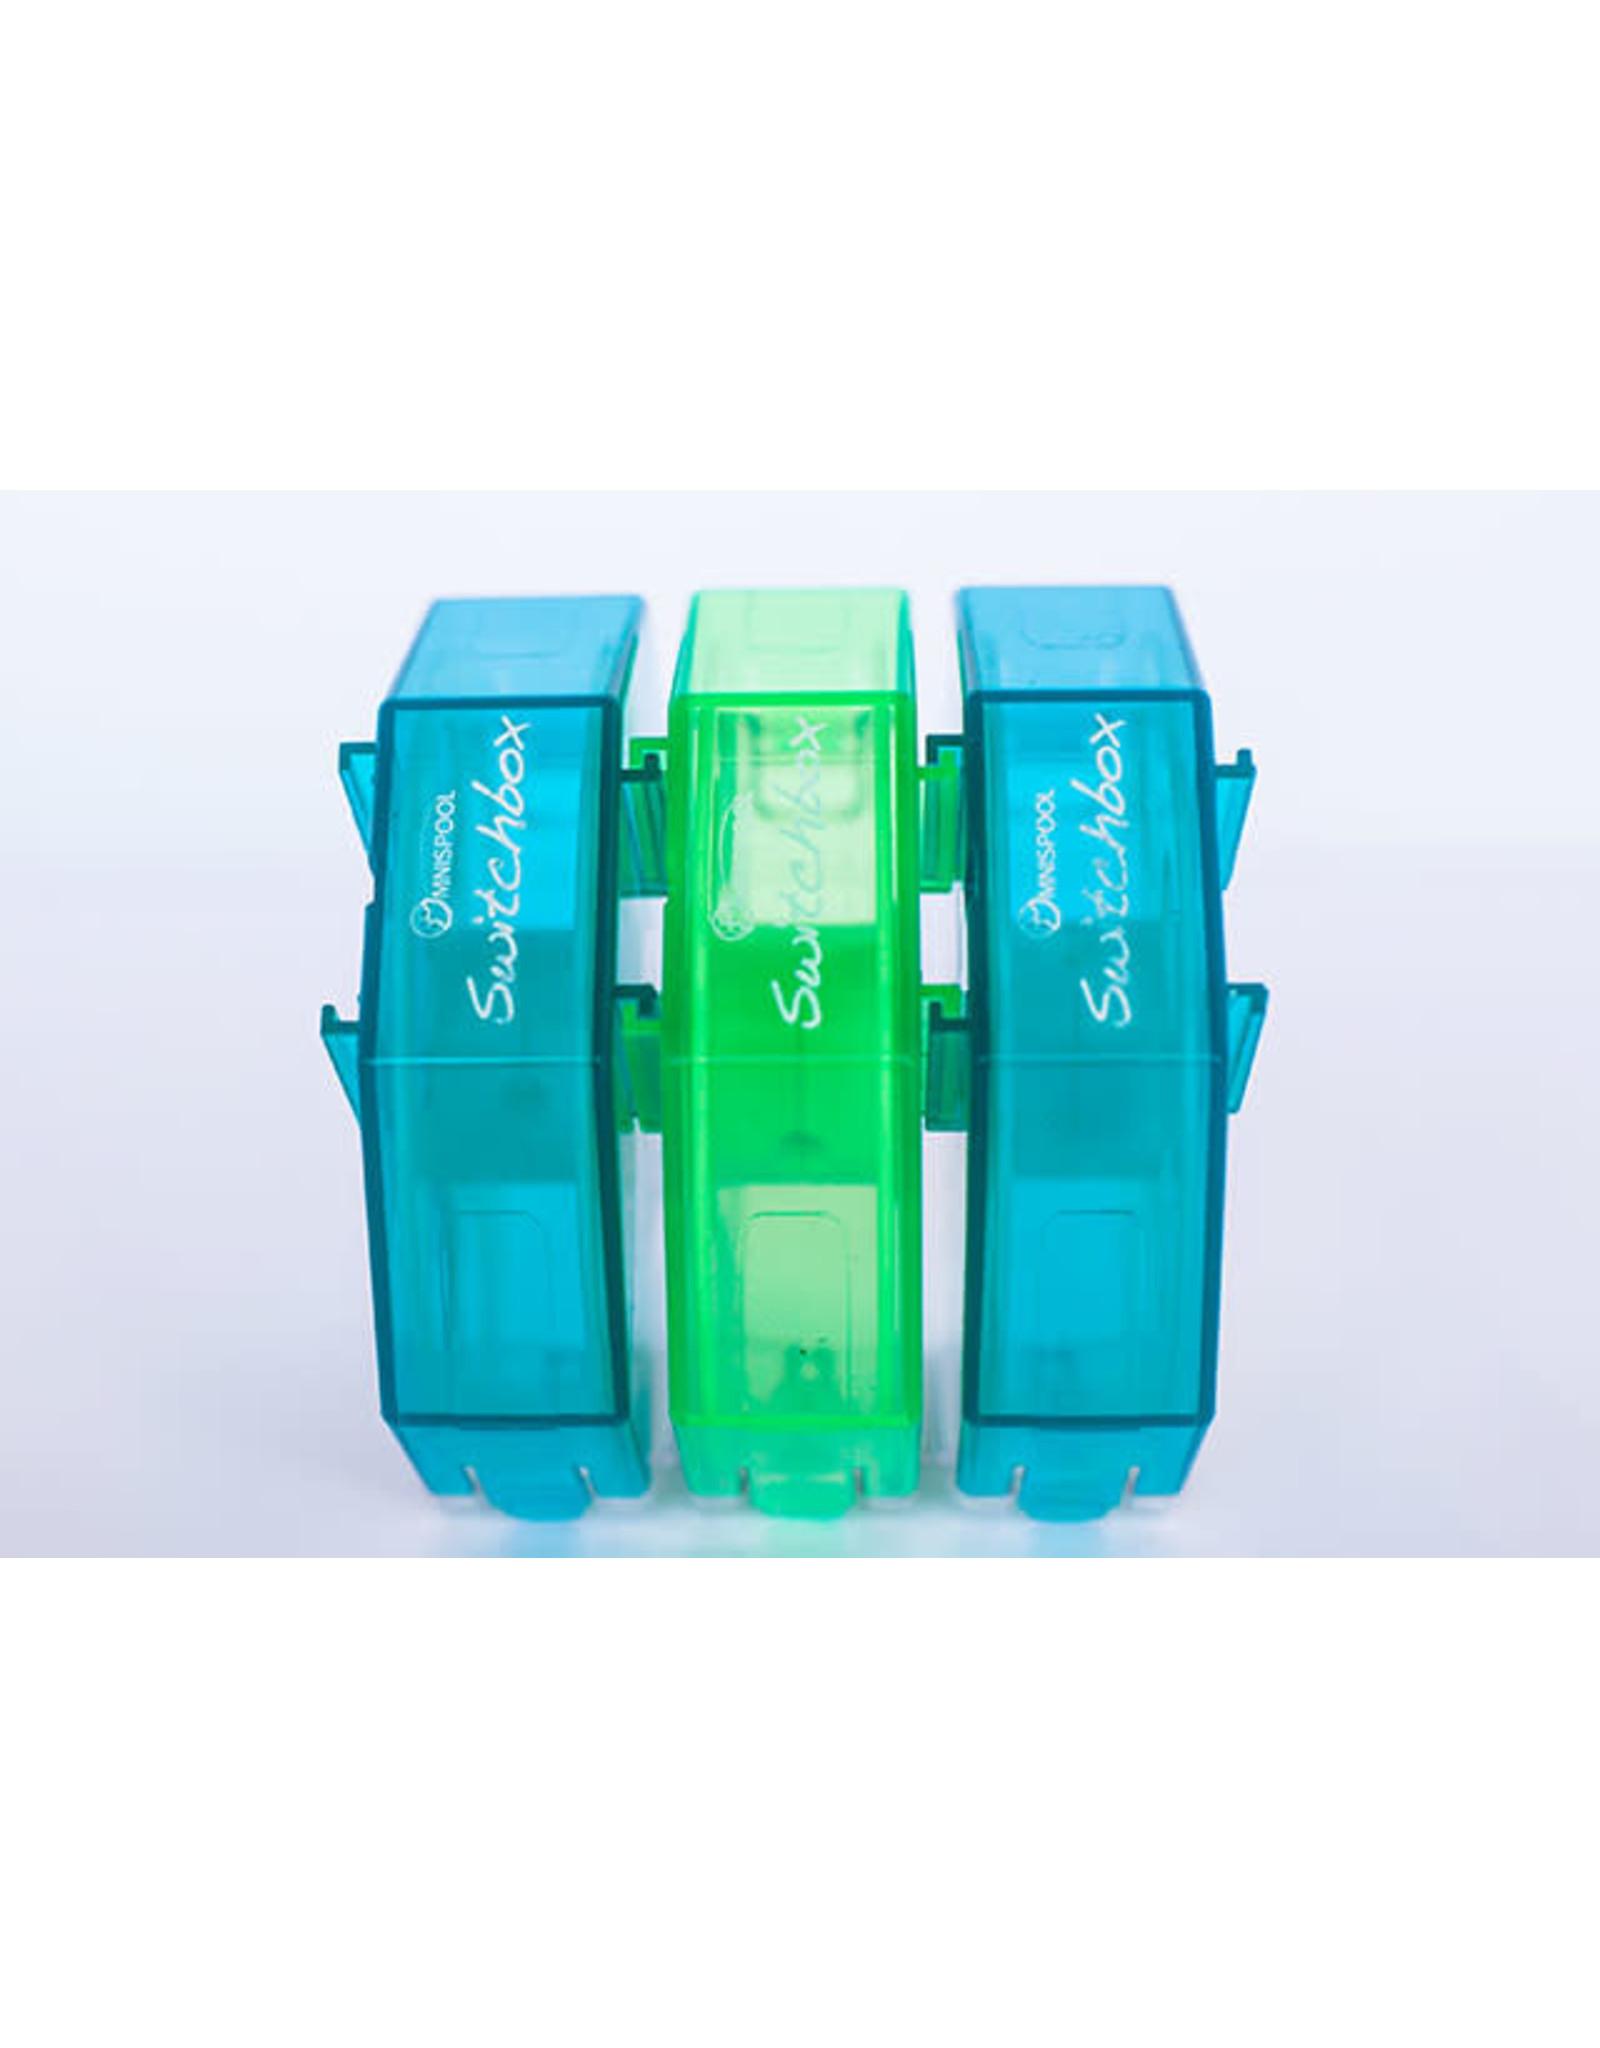 OMNISPOOL Complete Switchbox Kit By Omnispool